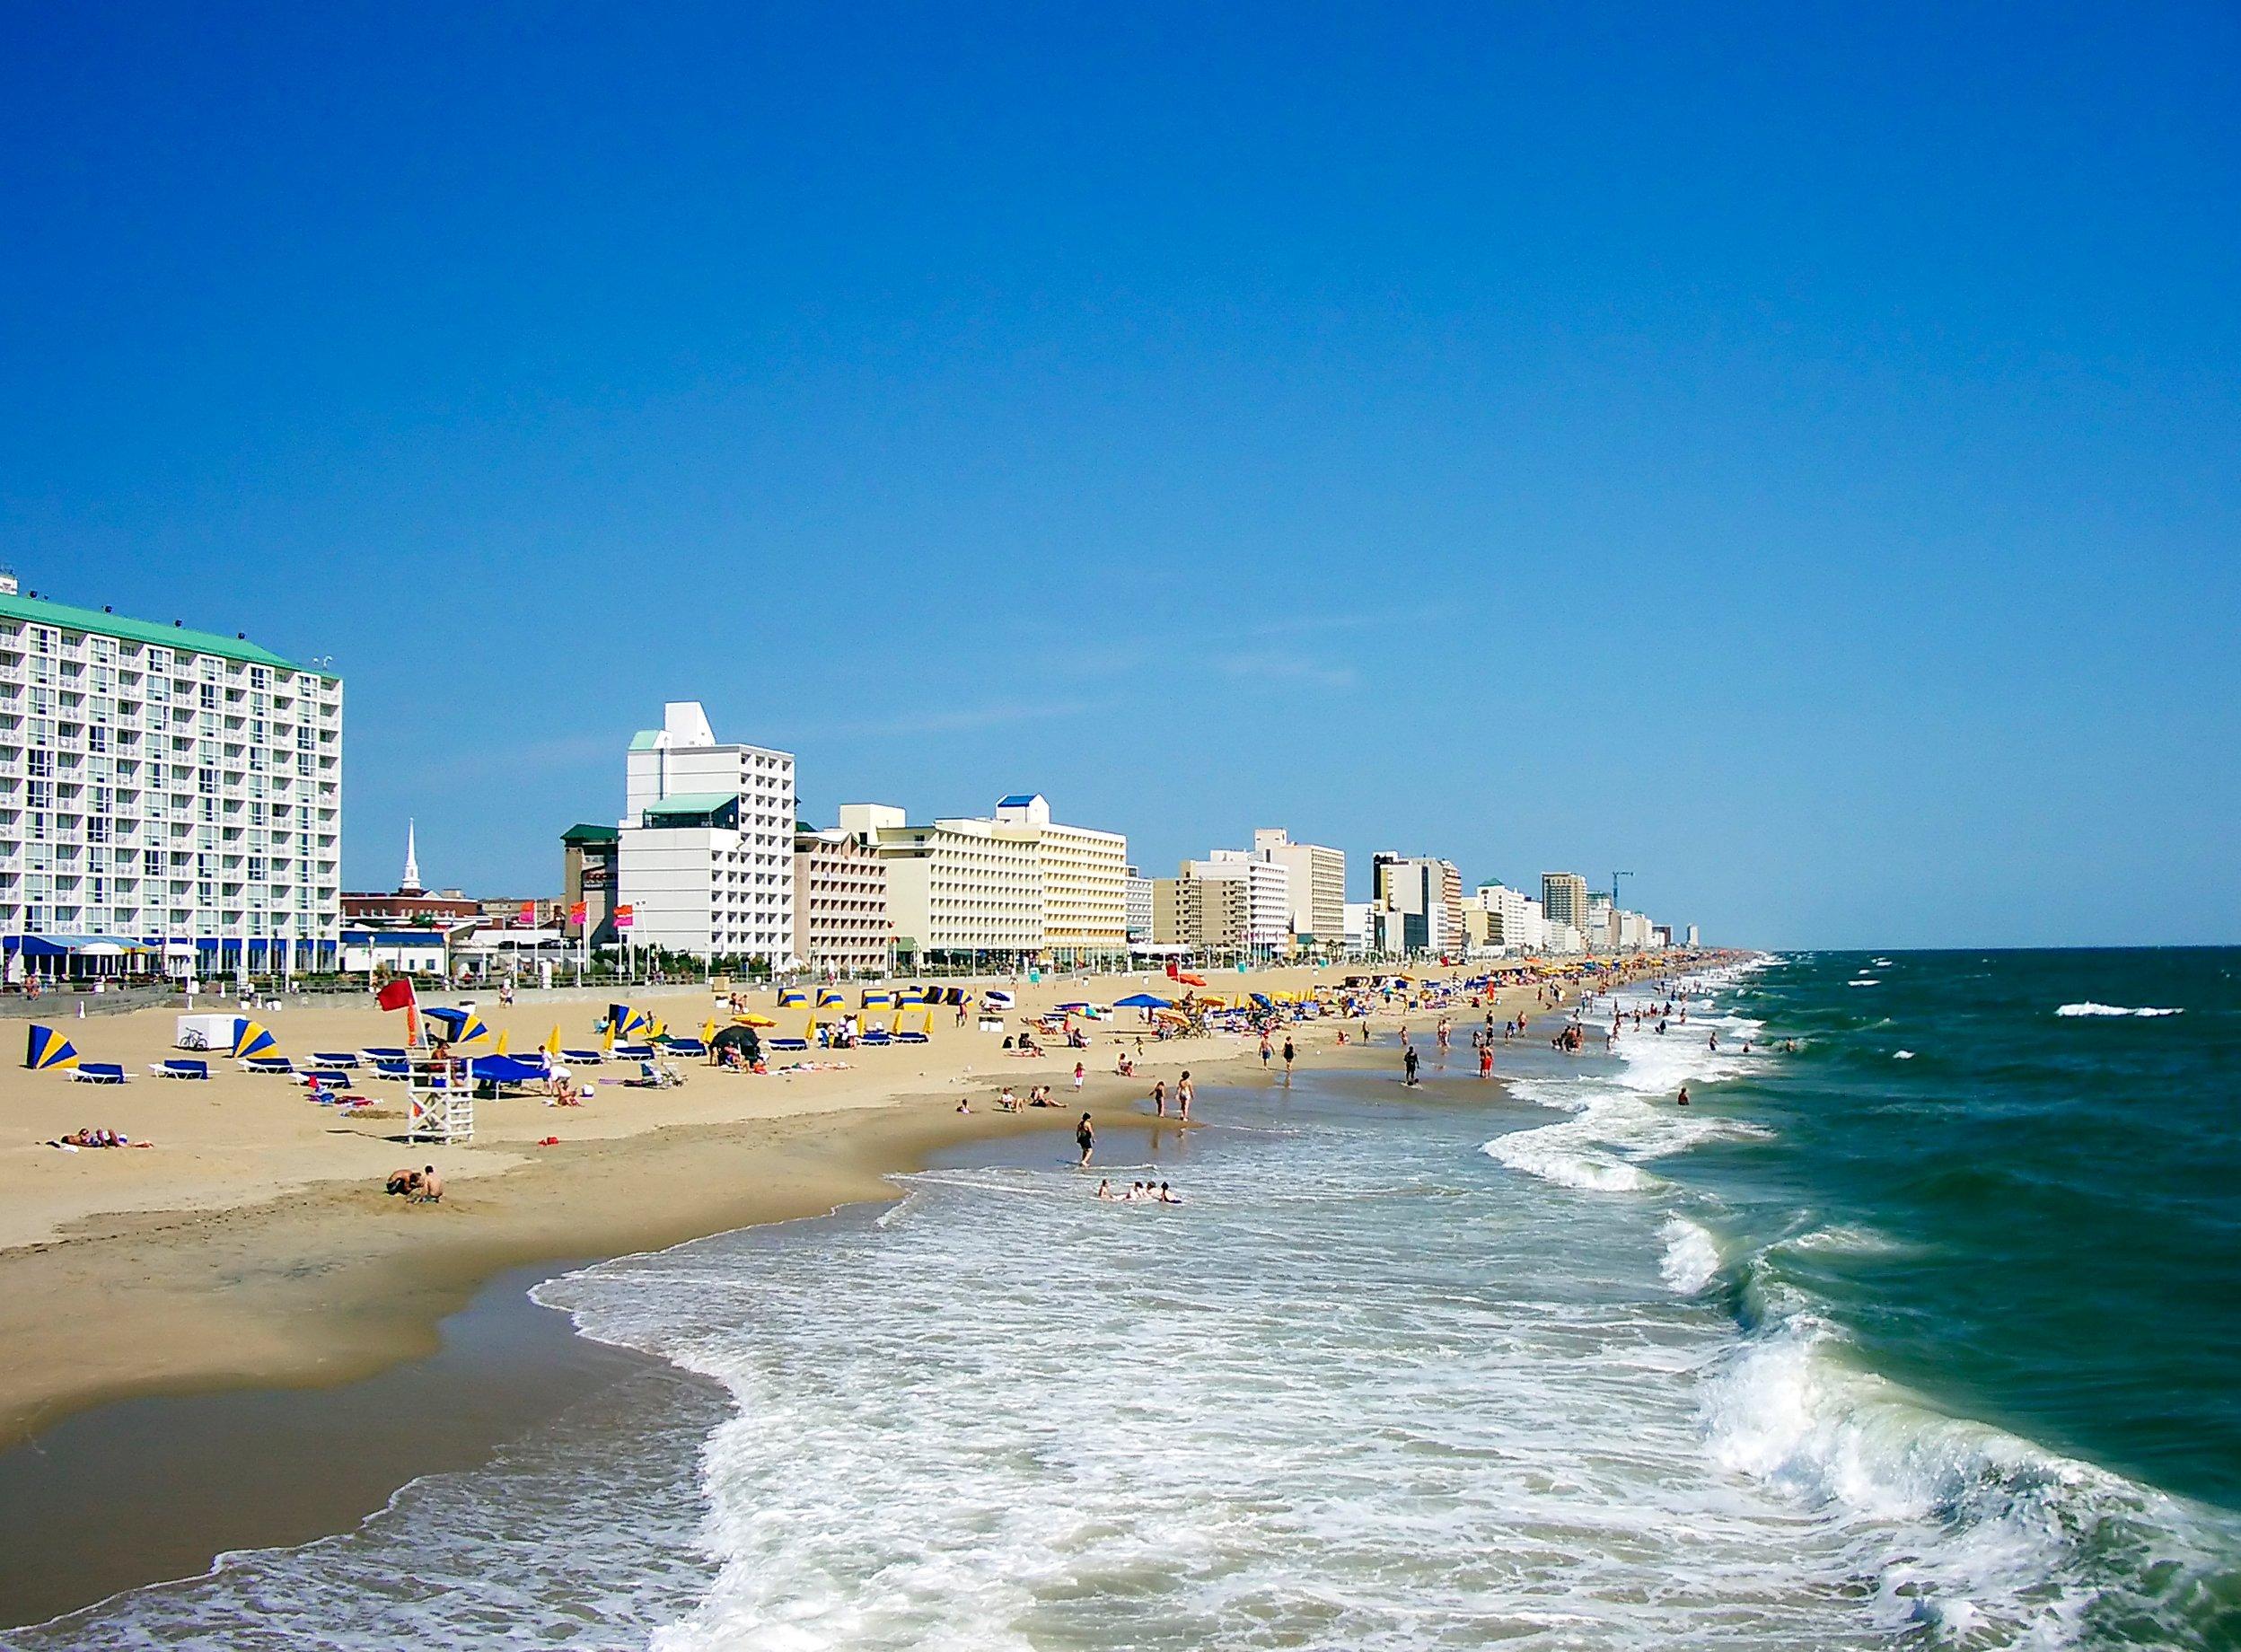 Millennials want to live in Virginia Beach